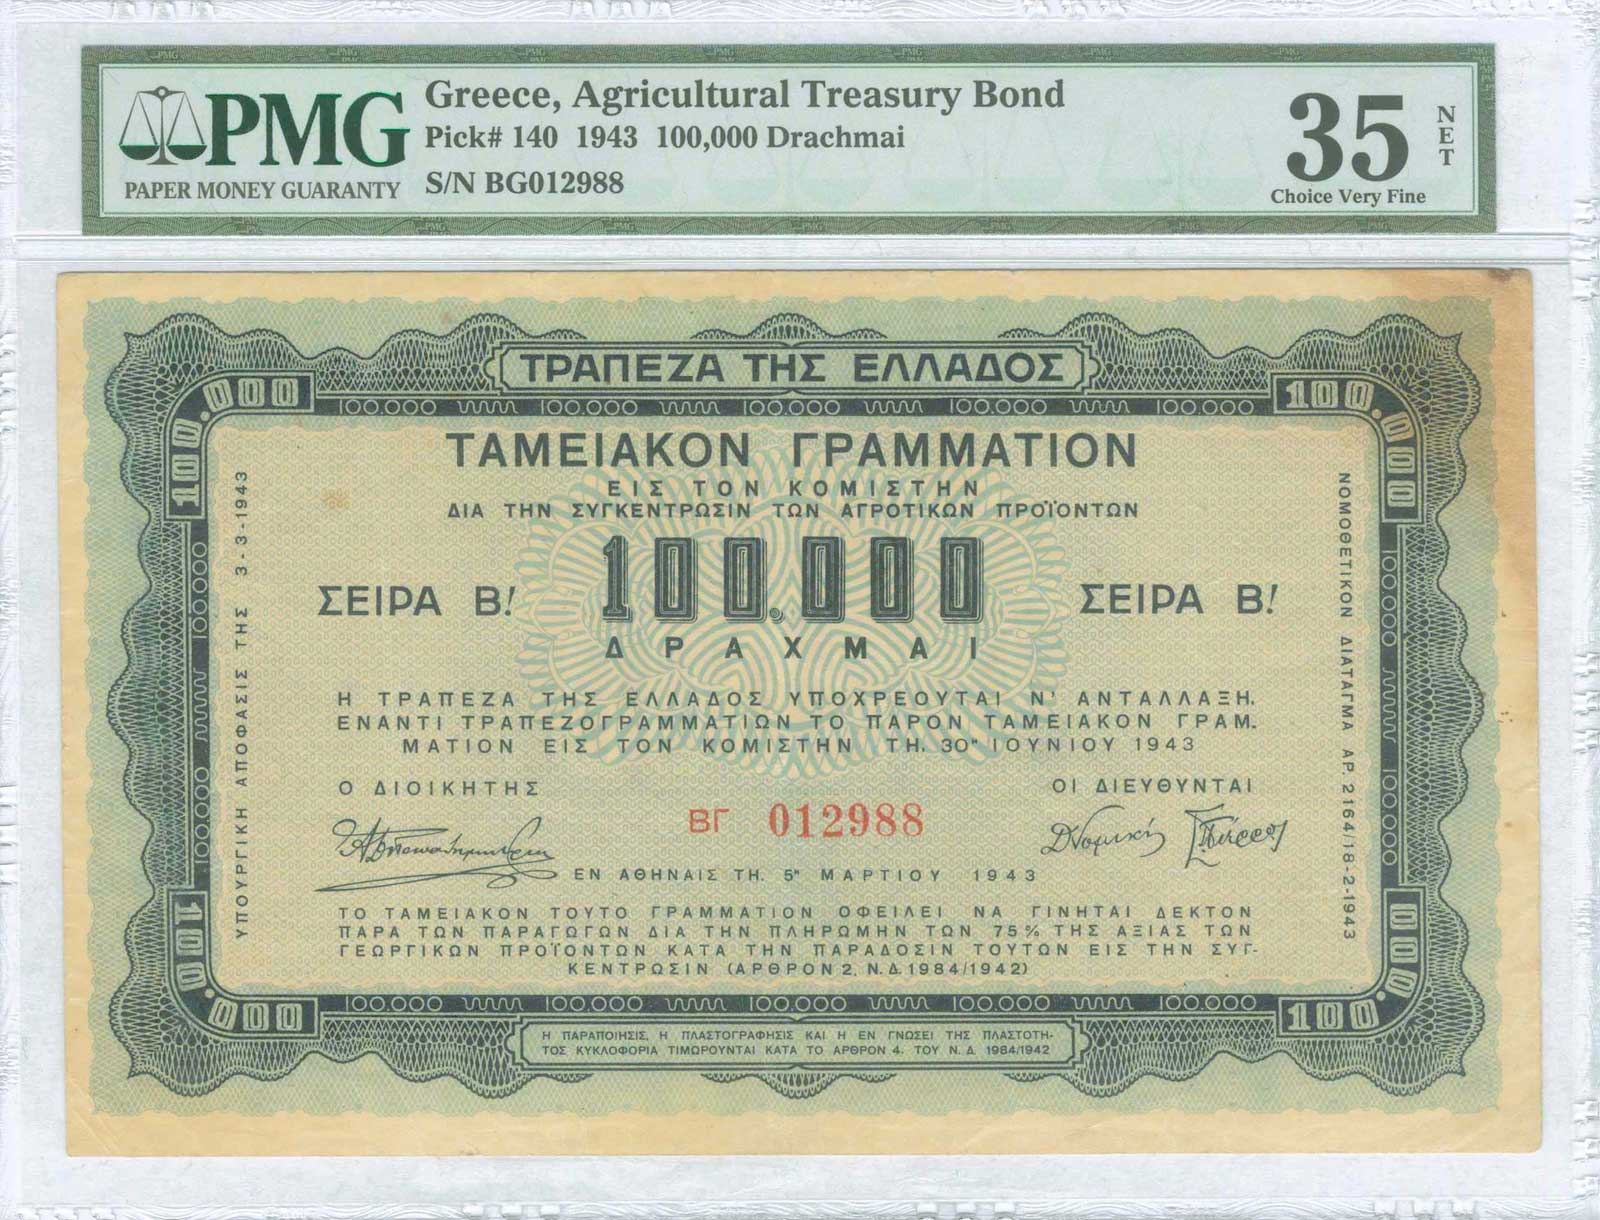 Lot 9384 - GREECE-  PAPER MONEY - BANKNOTES TREASURY BONDS & FISCAL NOTES -  A. Karamitsos Public & LIVE Bid Auction 610 Coins, Medals & Banknotes